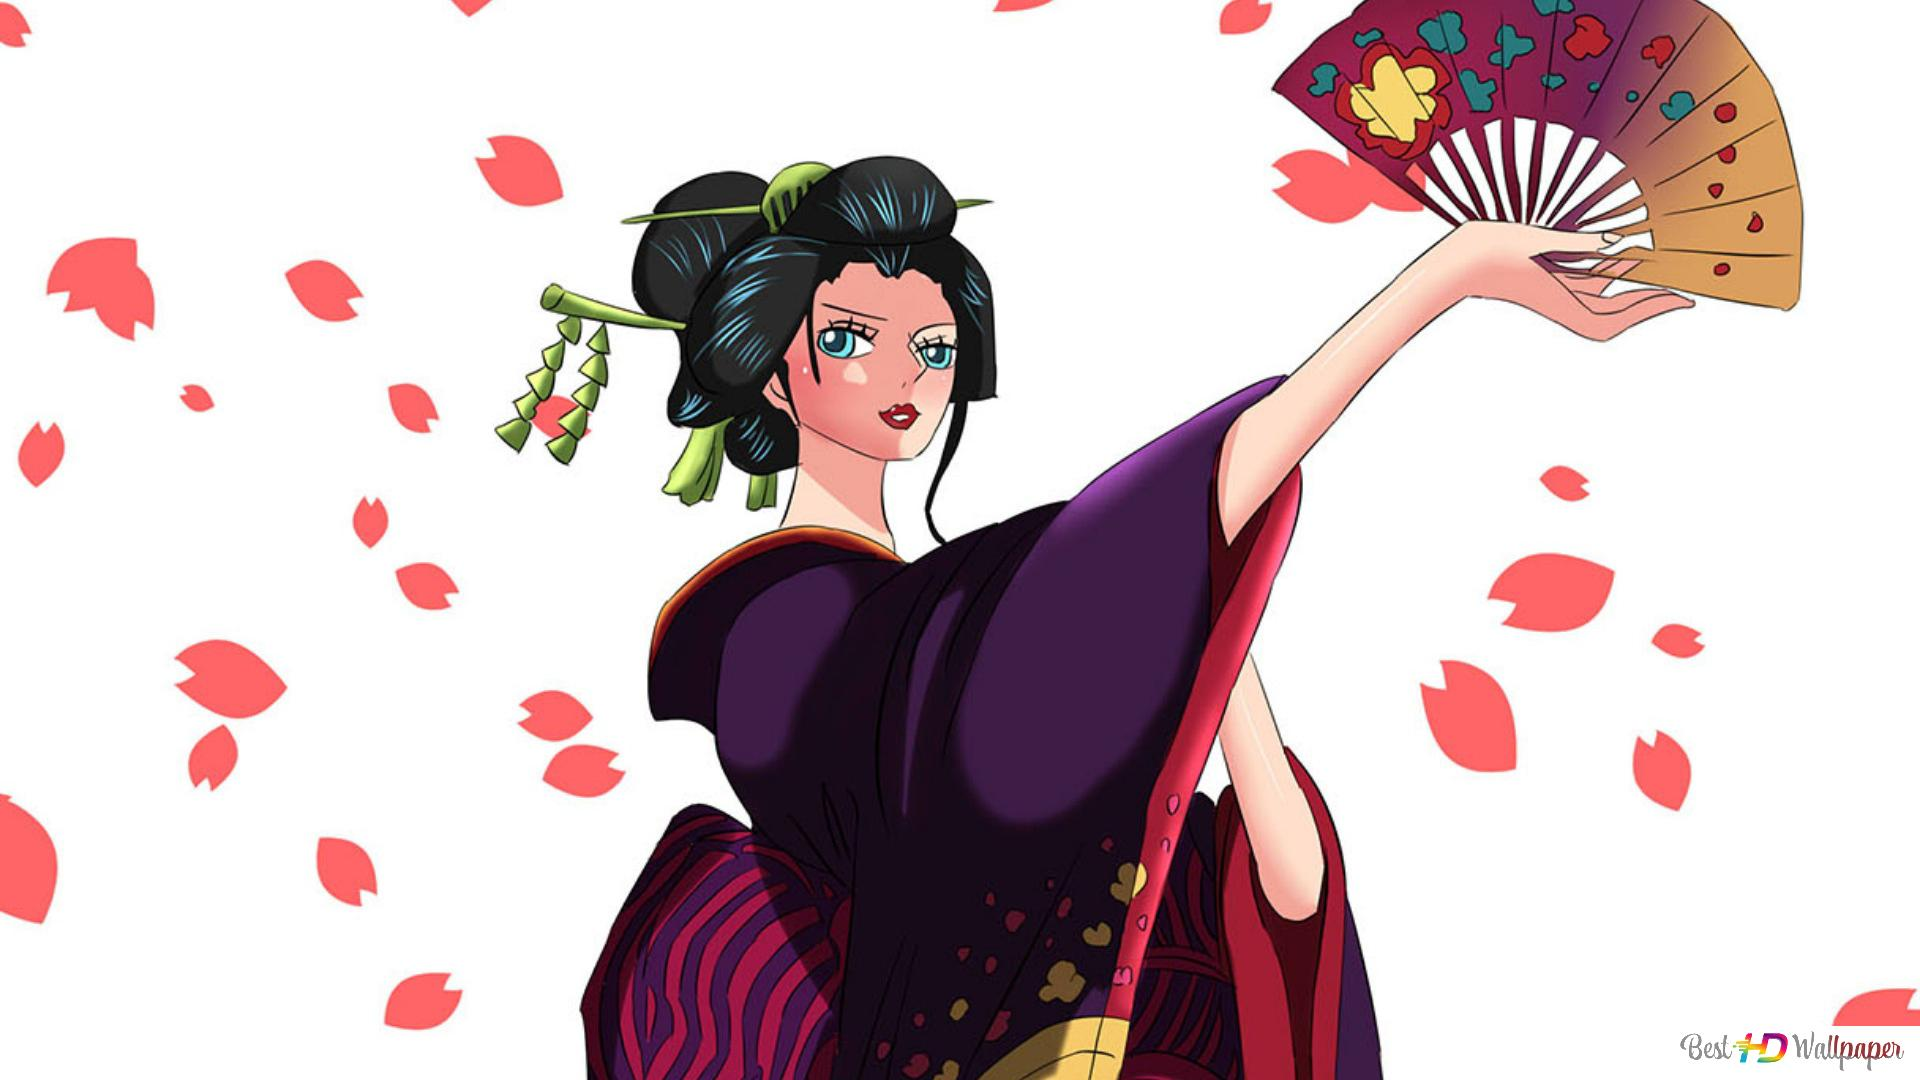 One Piece Nico Robin Wano Arc Hd Wallpaper Download